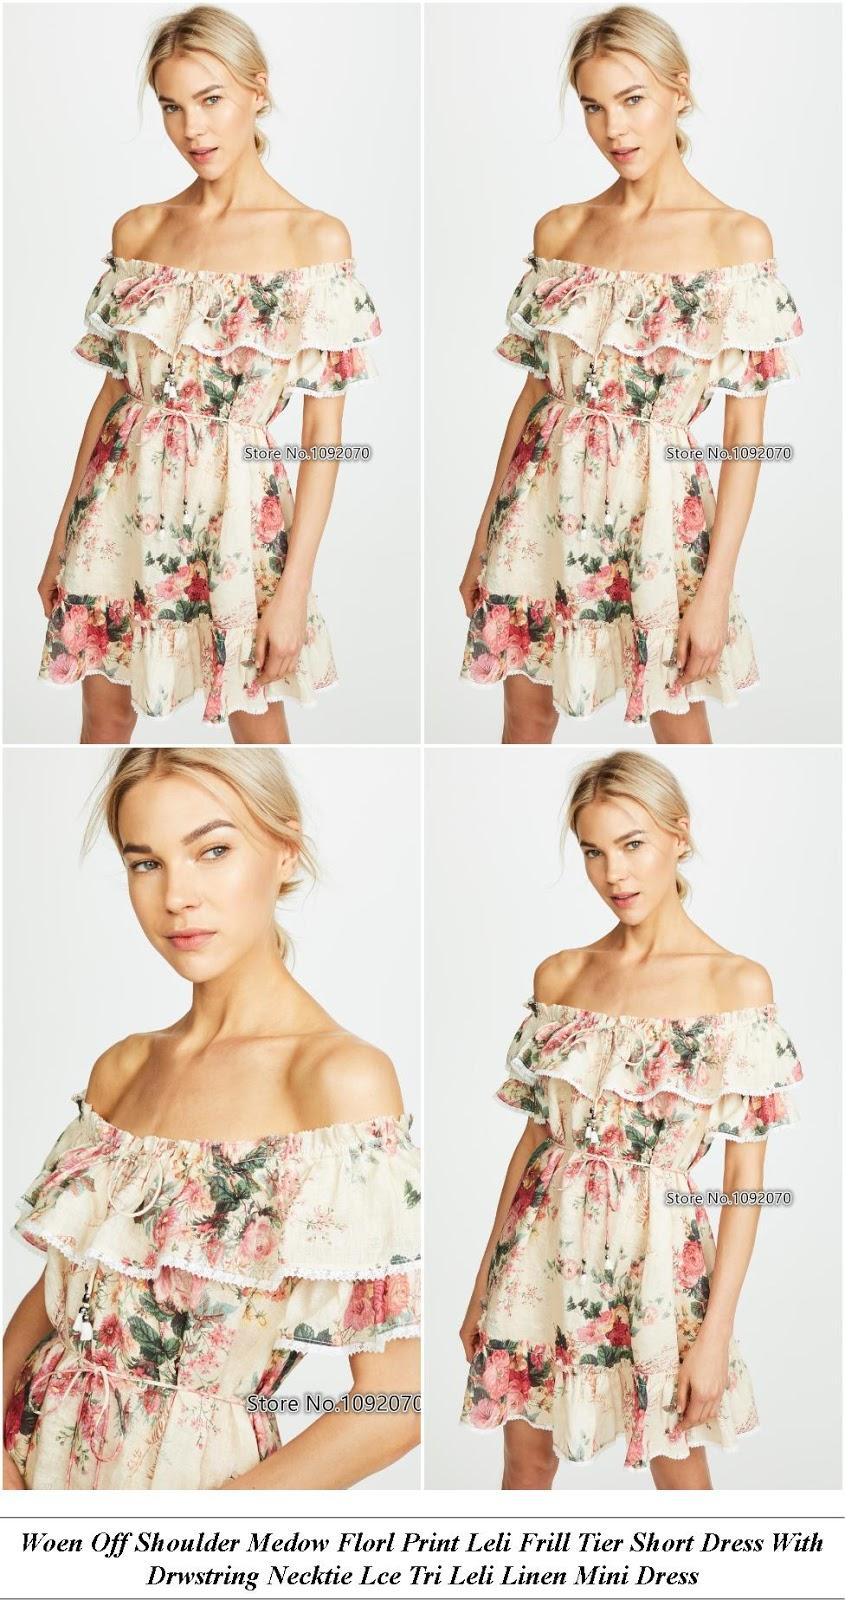 Short Prom Dresses - Shop For Sale - Long Sleeve Dress - Cheap Ladies Clothes